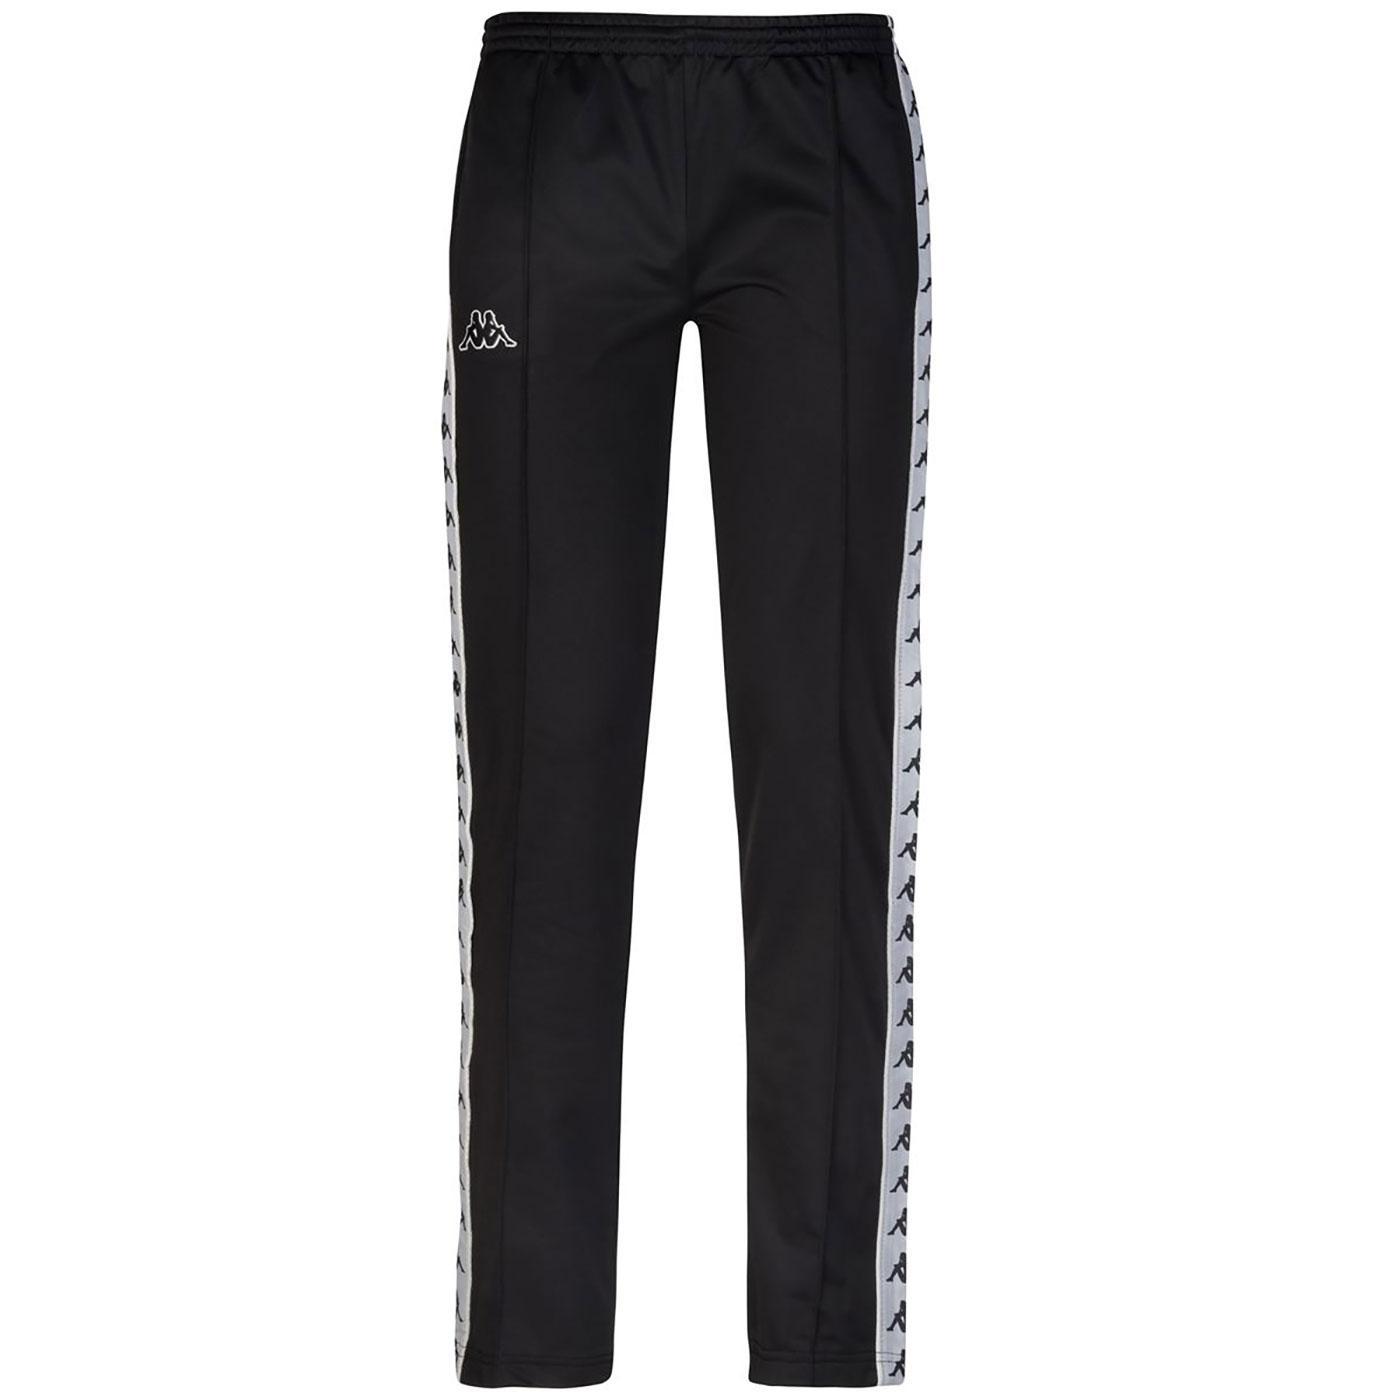 Wastoria Snaps KAPPA Women's slim Track Pants (B)